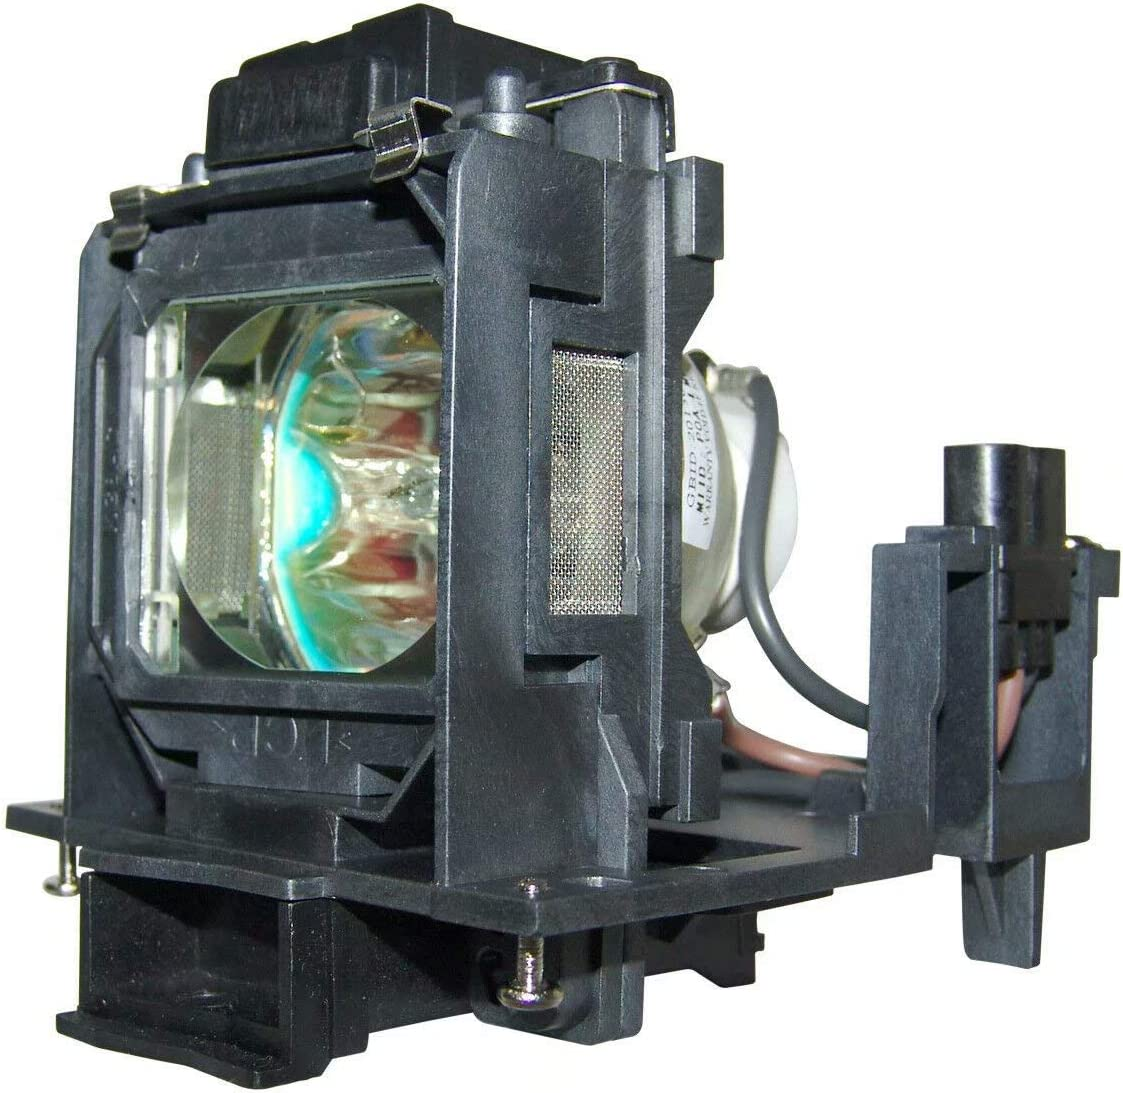 Supermait POA-LMP143 610 351 3744 L/ámpara Bulbo Bombilla de Repuesto para proyector con Carcasa Compatible con SANYO PDG-DWL2500 PDG-DXL2000 PDG-DXL2000e PDG DWL2500 PDG DXL2000 PDG DXL2000e Lampara